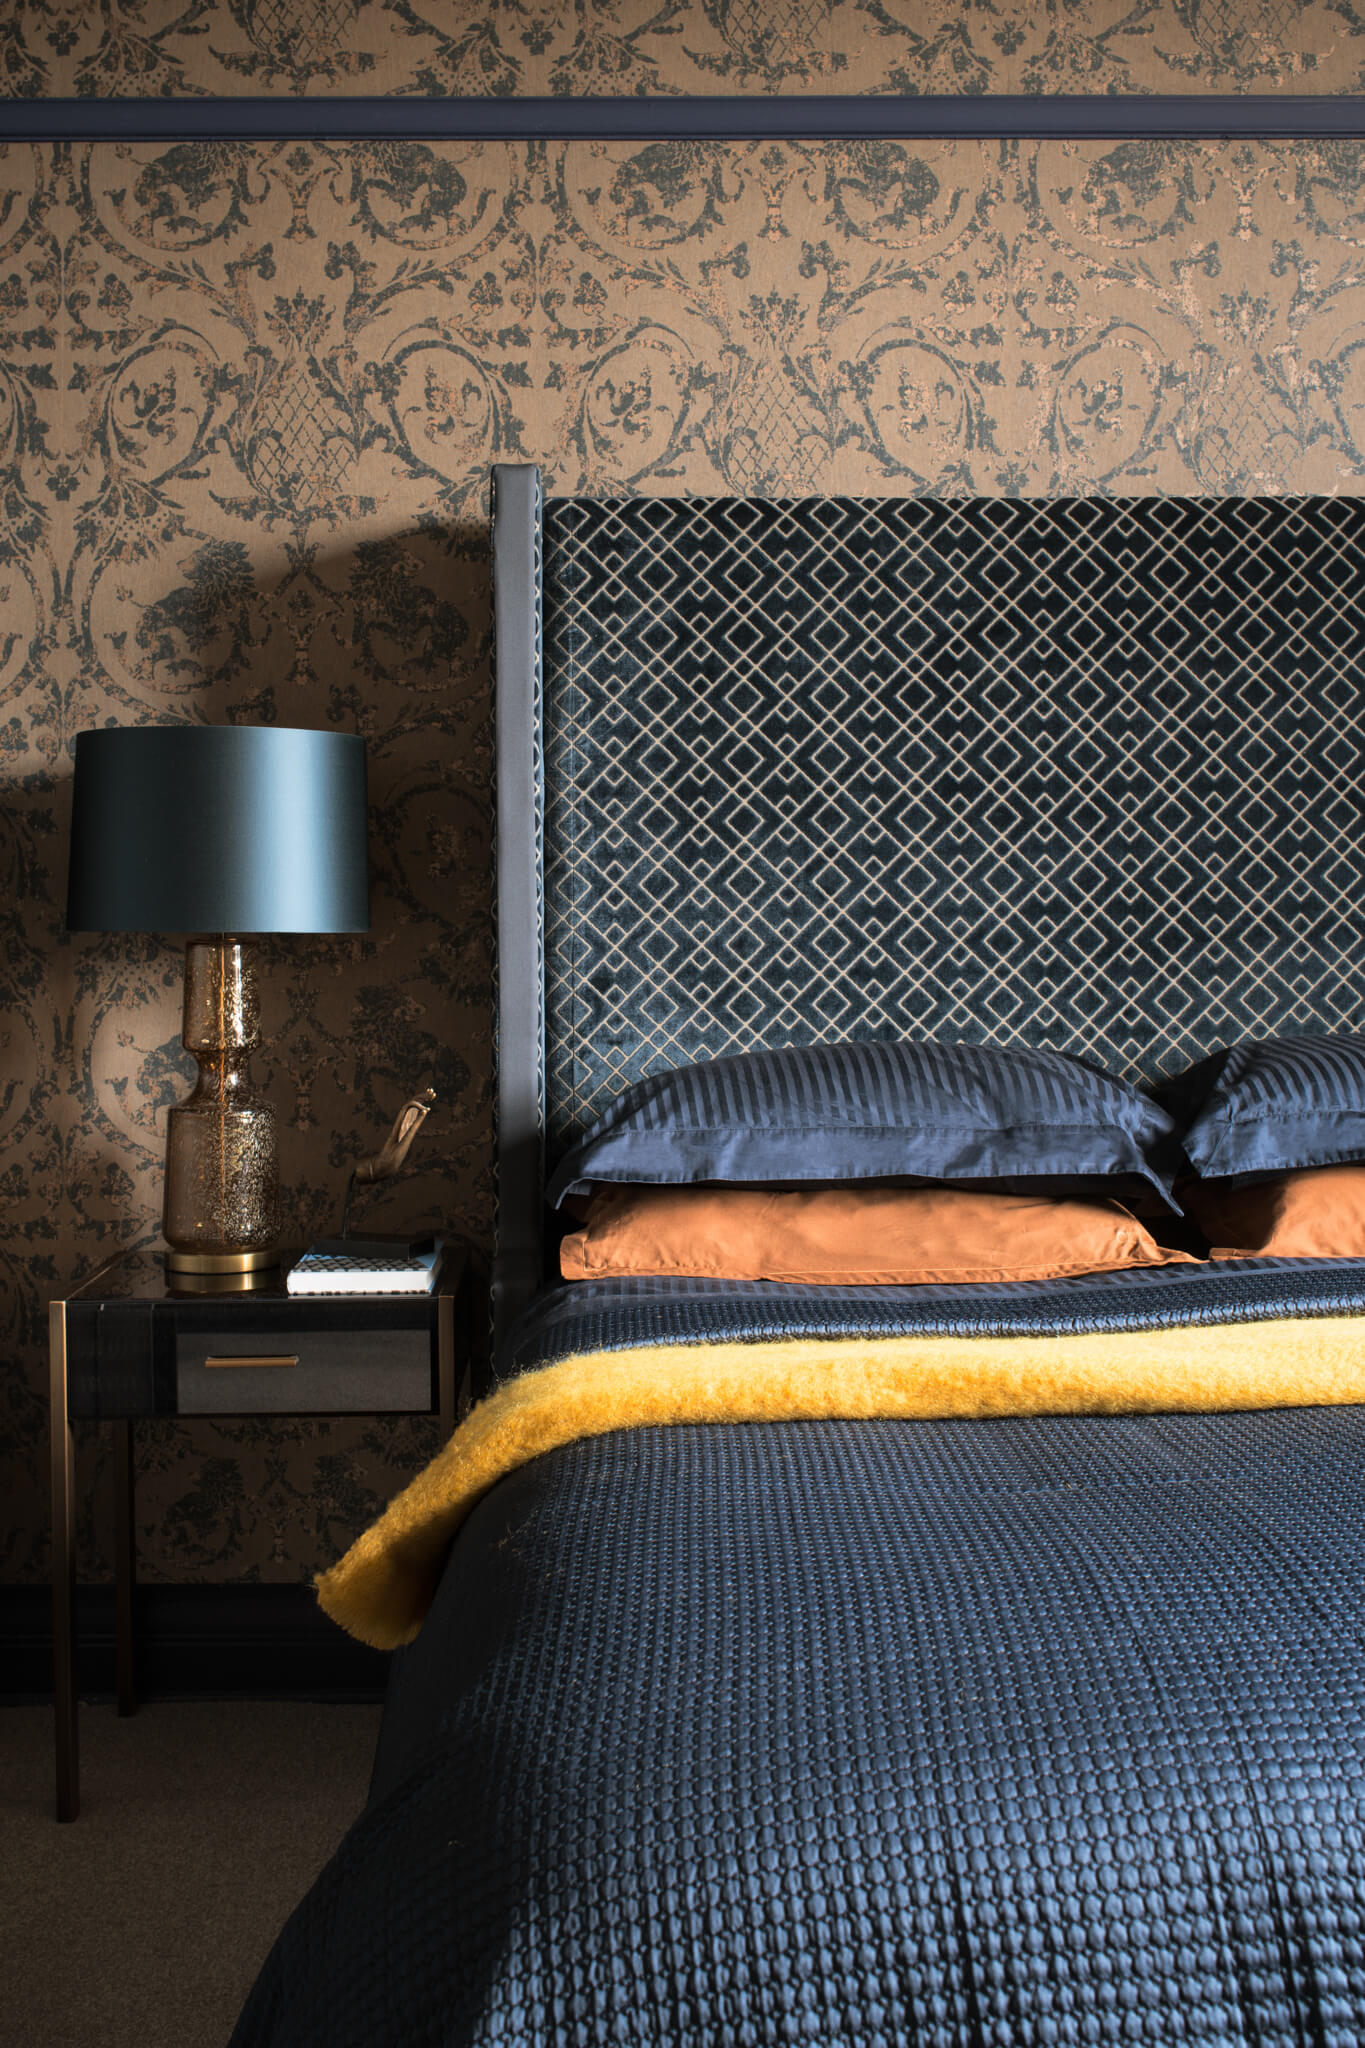 Print-Masterbedroom-onepoint-Chelsea-Mclaine-Interiors-Introductory-Shoot-©ZACandZAC